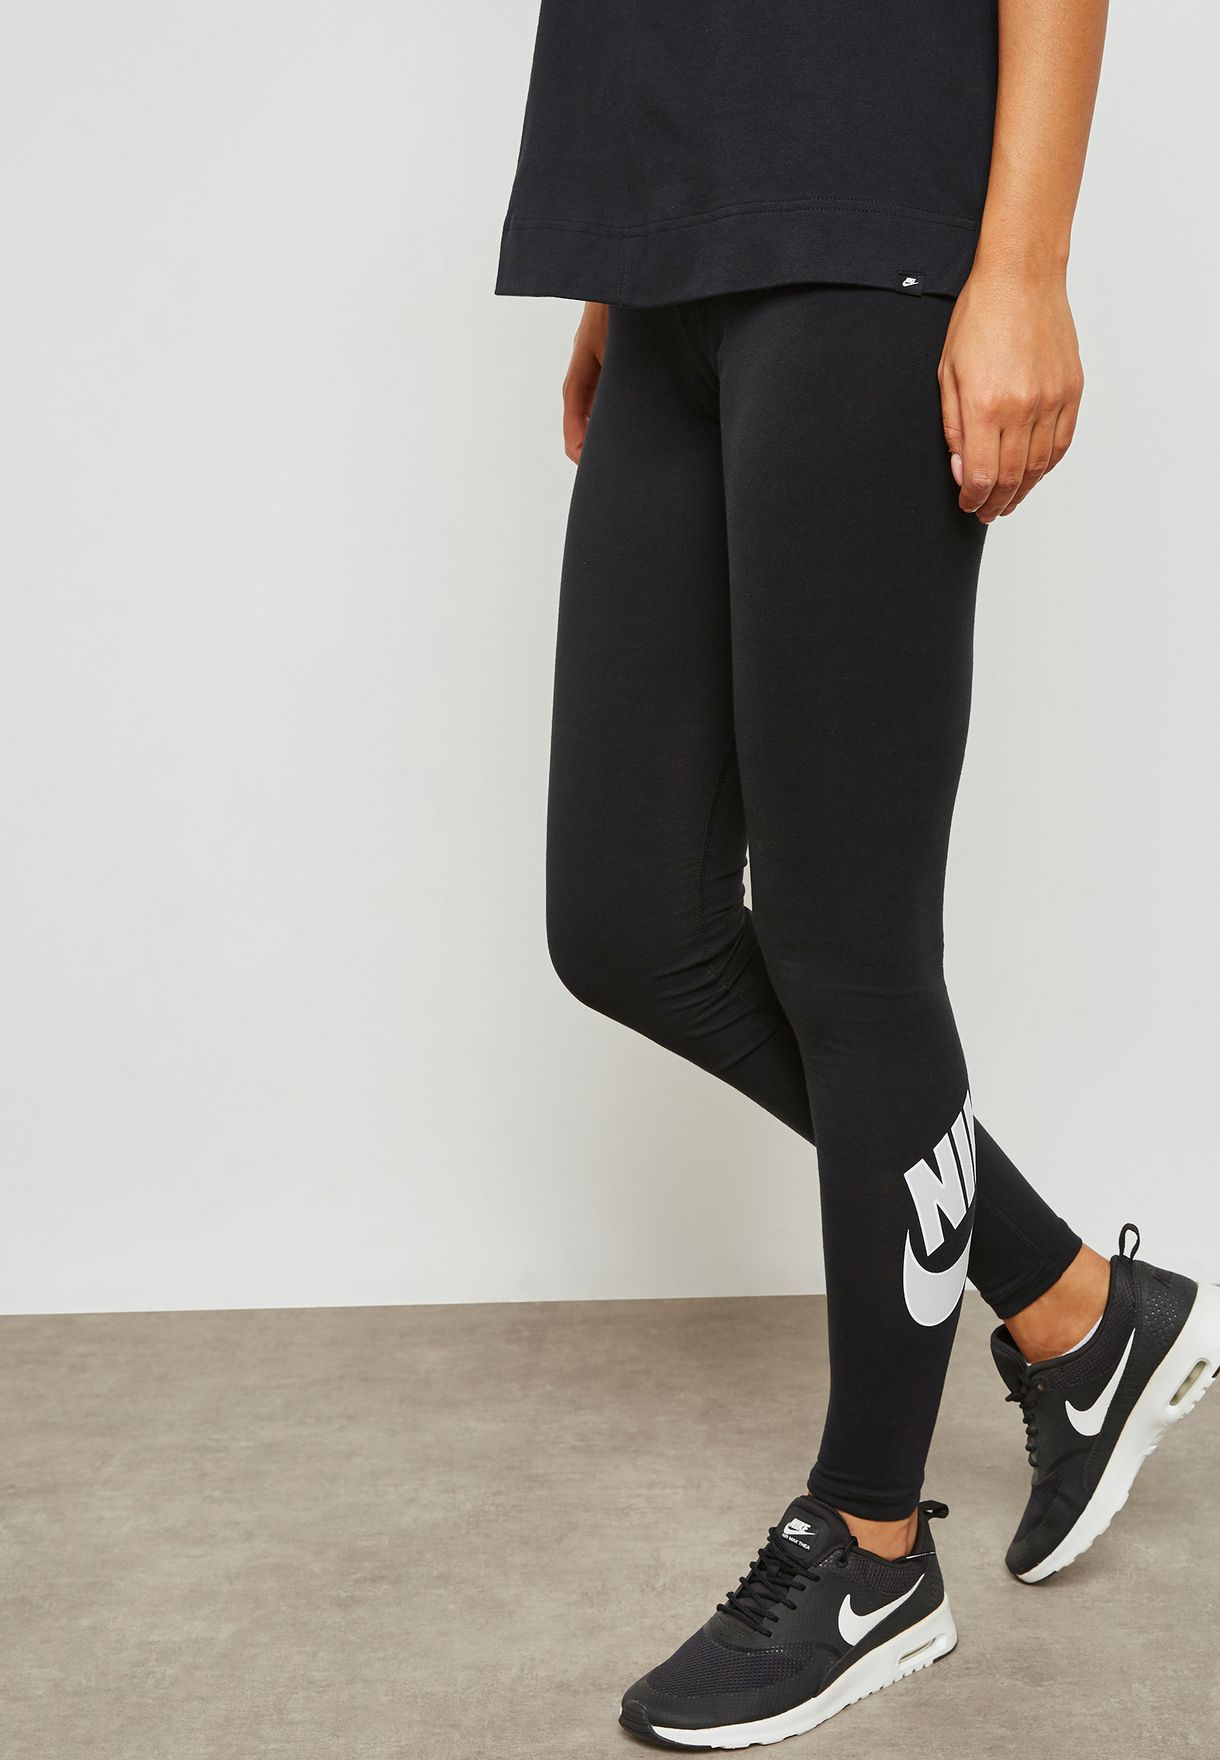 6ed10c9ae743 Shop Nike black Futura Club Leggings 929176-010 for Women in UAE ...